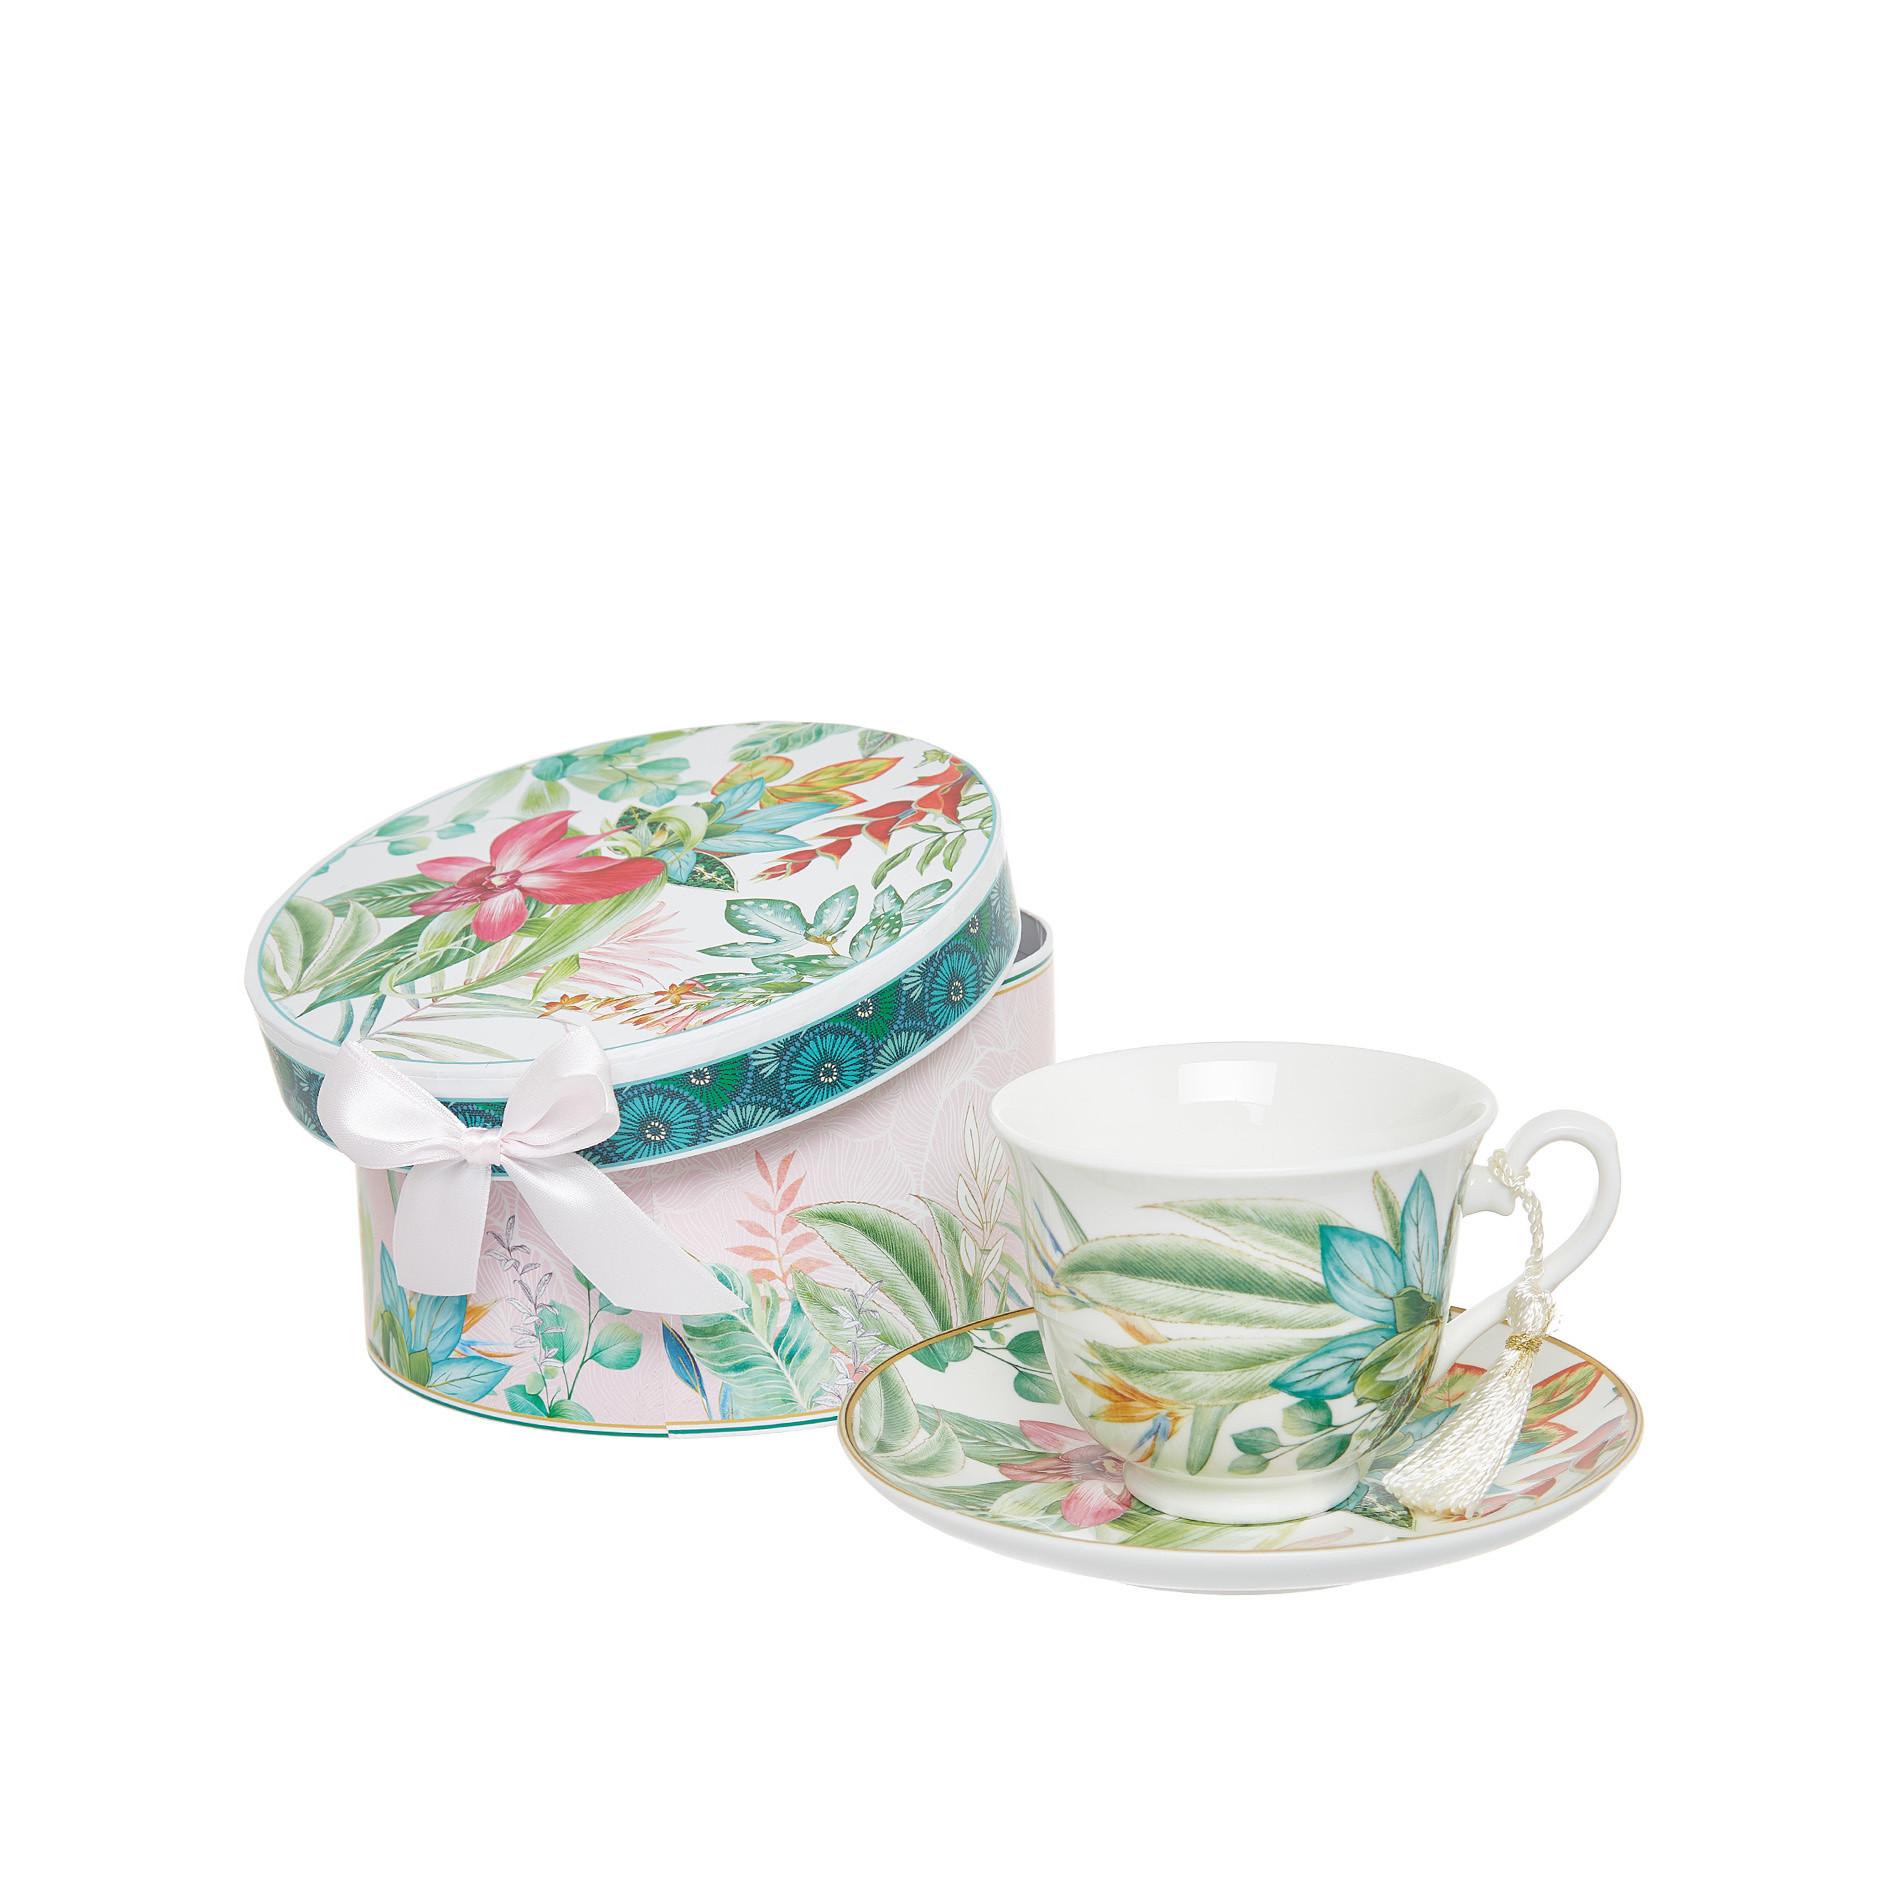 Tazza tè new bone china decoro amazzonia, Multicolor, large image number 0